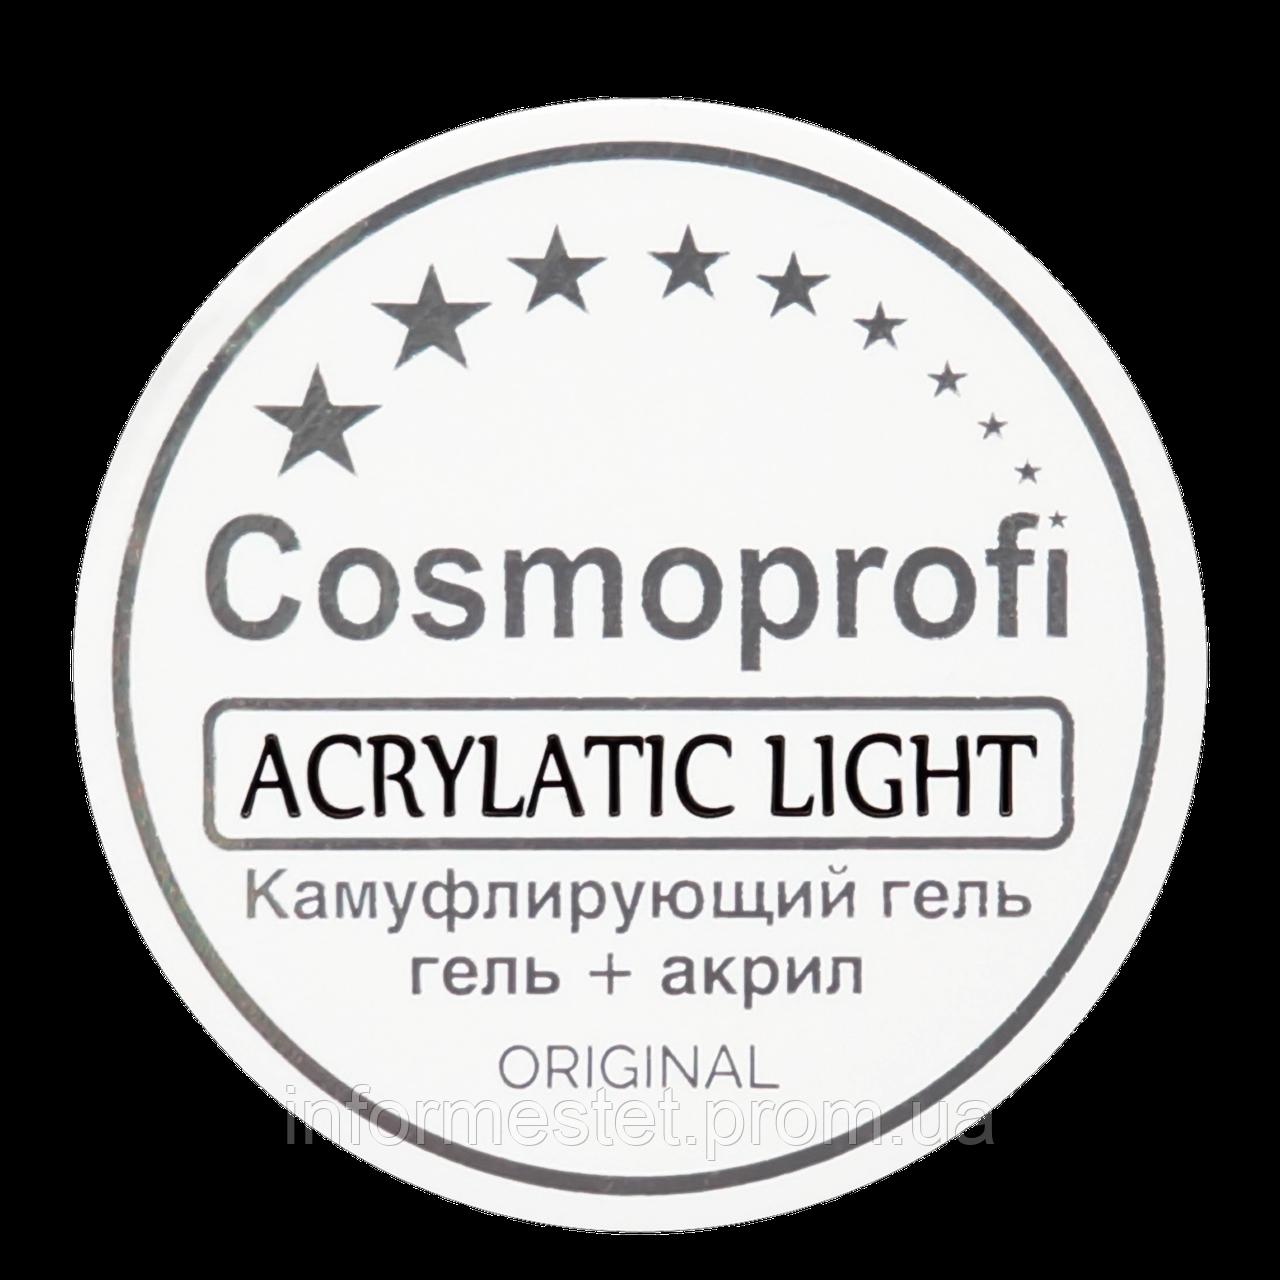 Acrylatic Light 50g